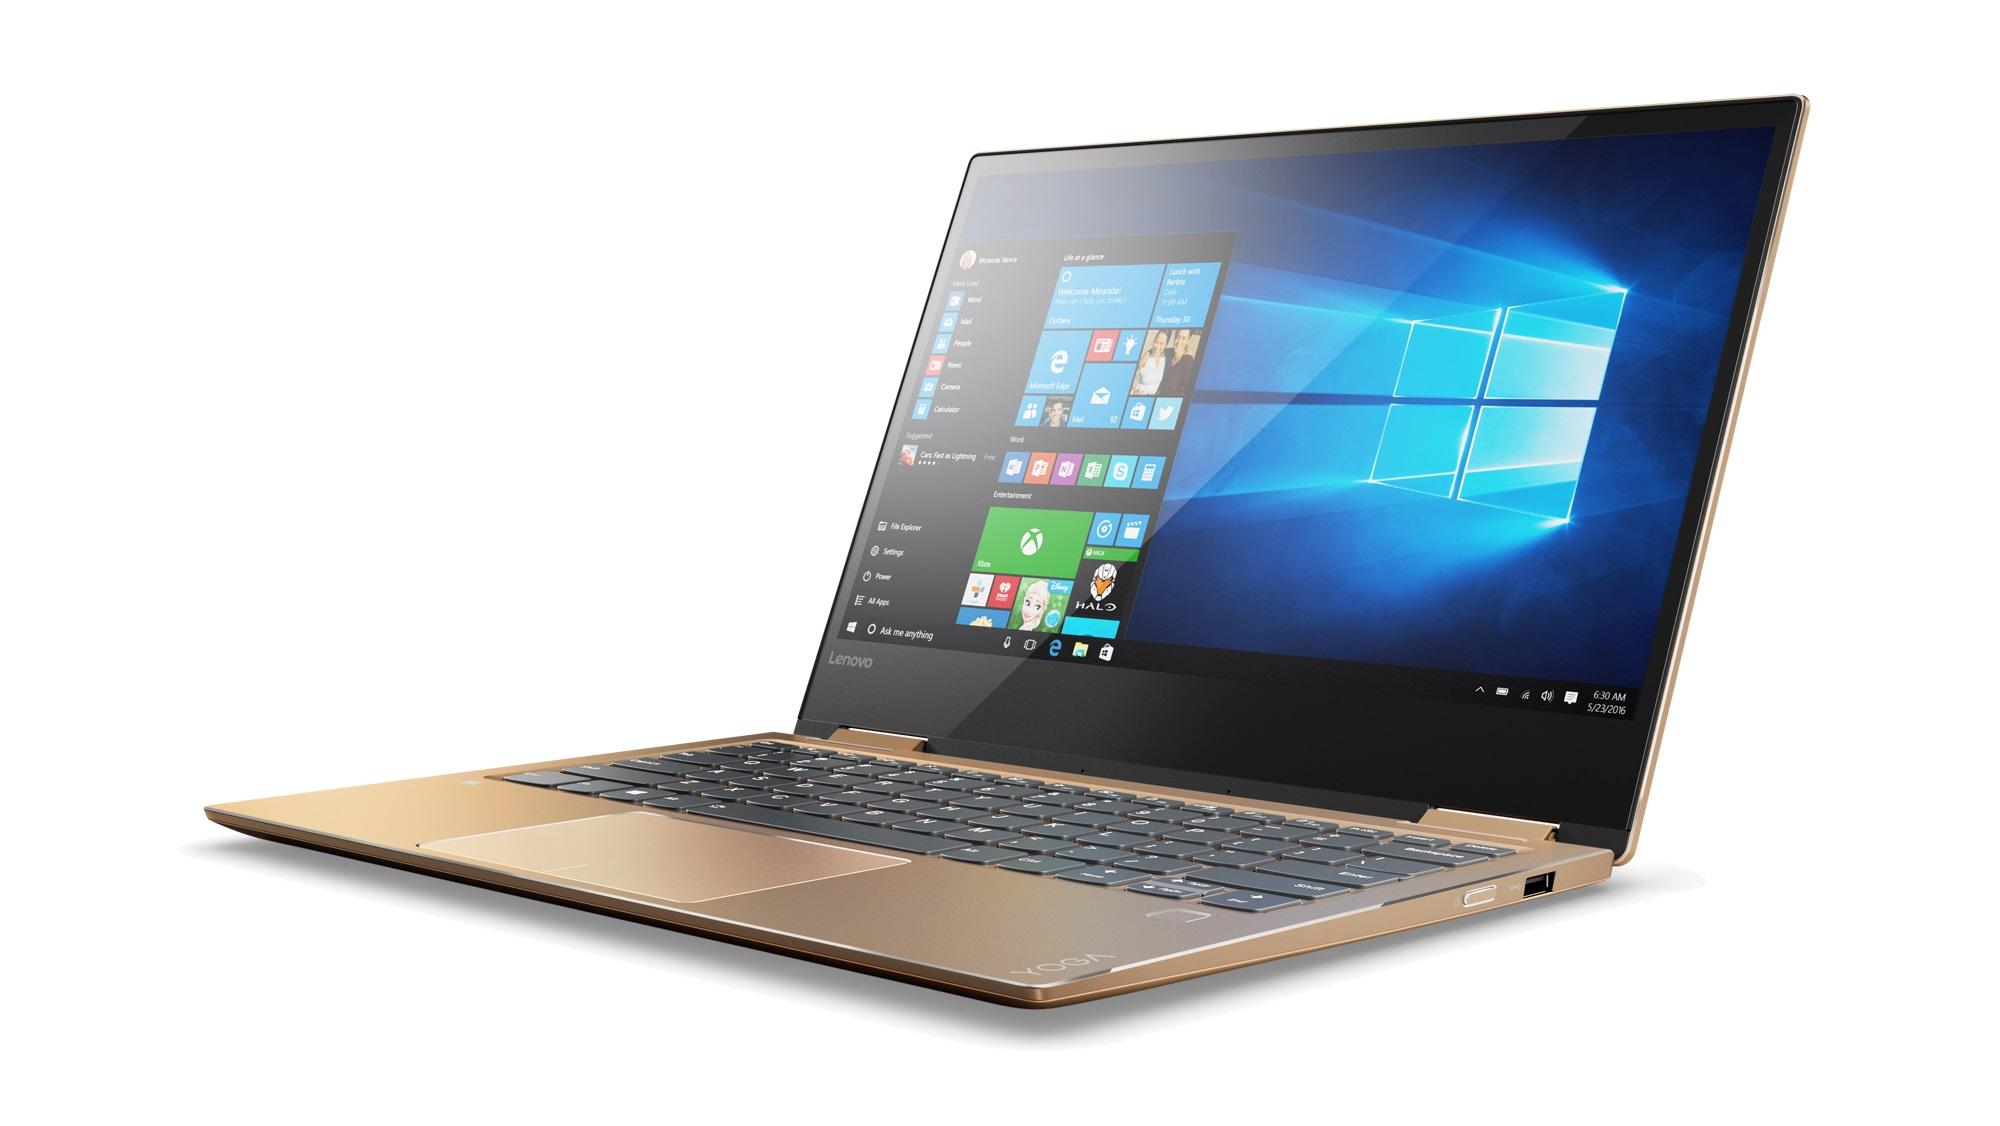 "Lenovo YOGA 720-13IKB i5-7200U 3,10GHz/8GB/SSD 256GB/13,3"" FHD/AG/multitouch/WIN10 měděná 80X60017CK"